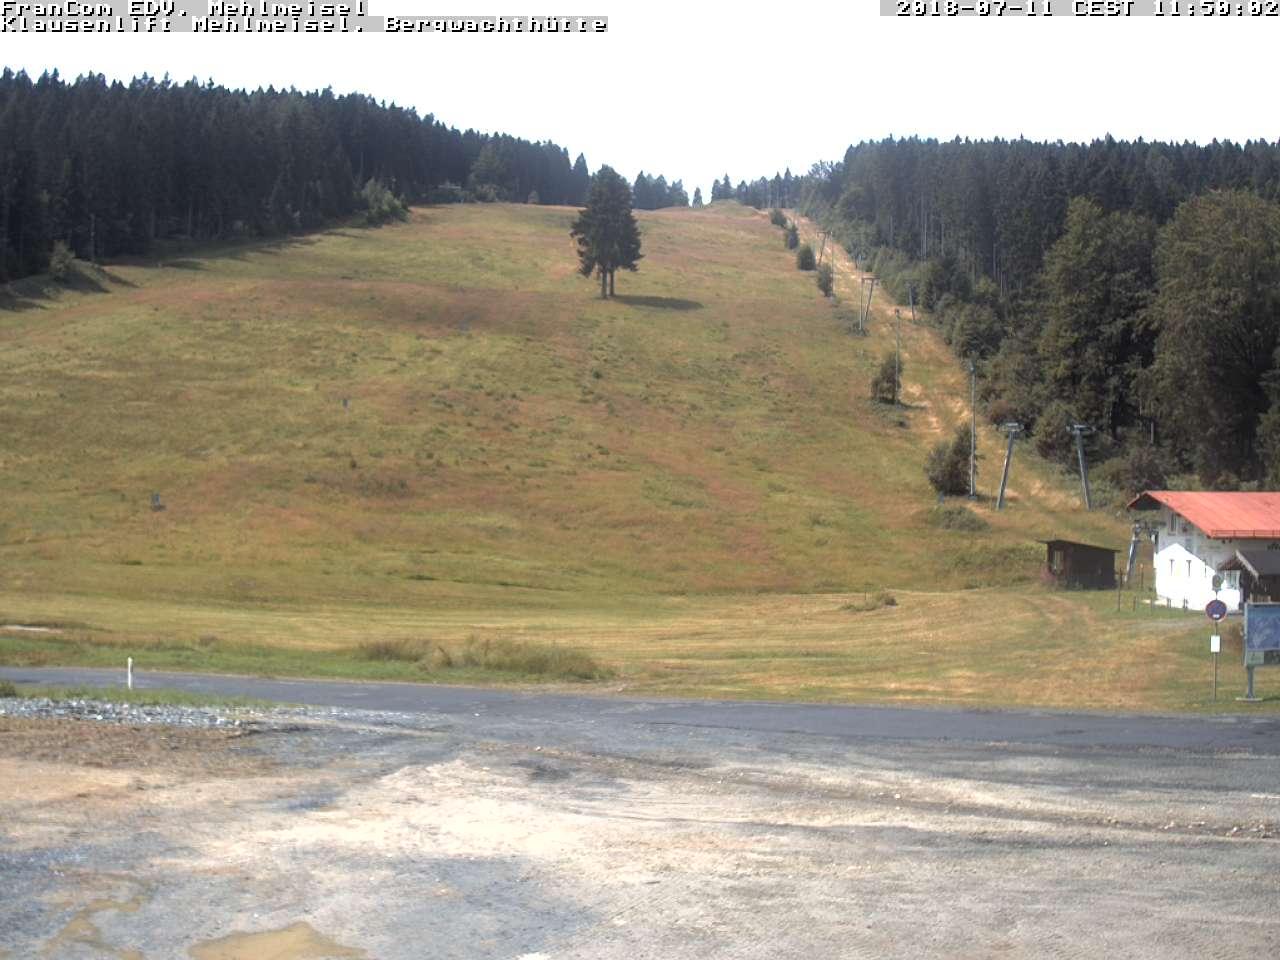 Webcam Ski Resort Mehlmeisel - Klausenlifte Fichtel Mountains